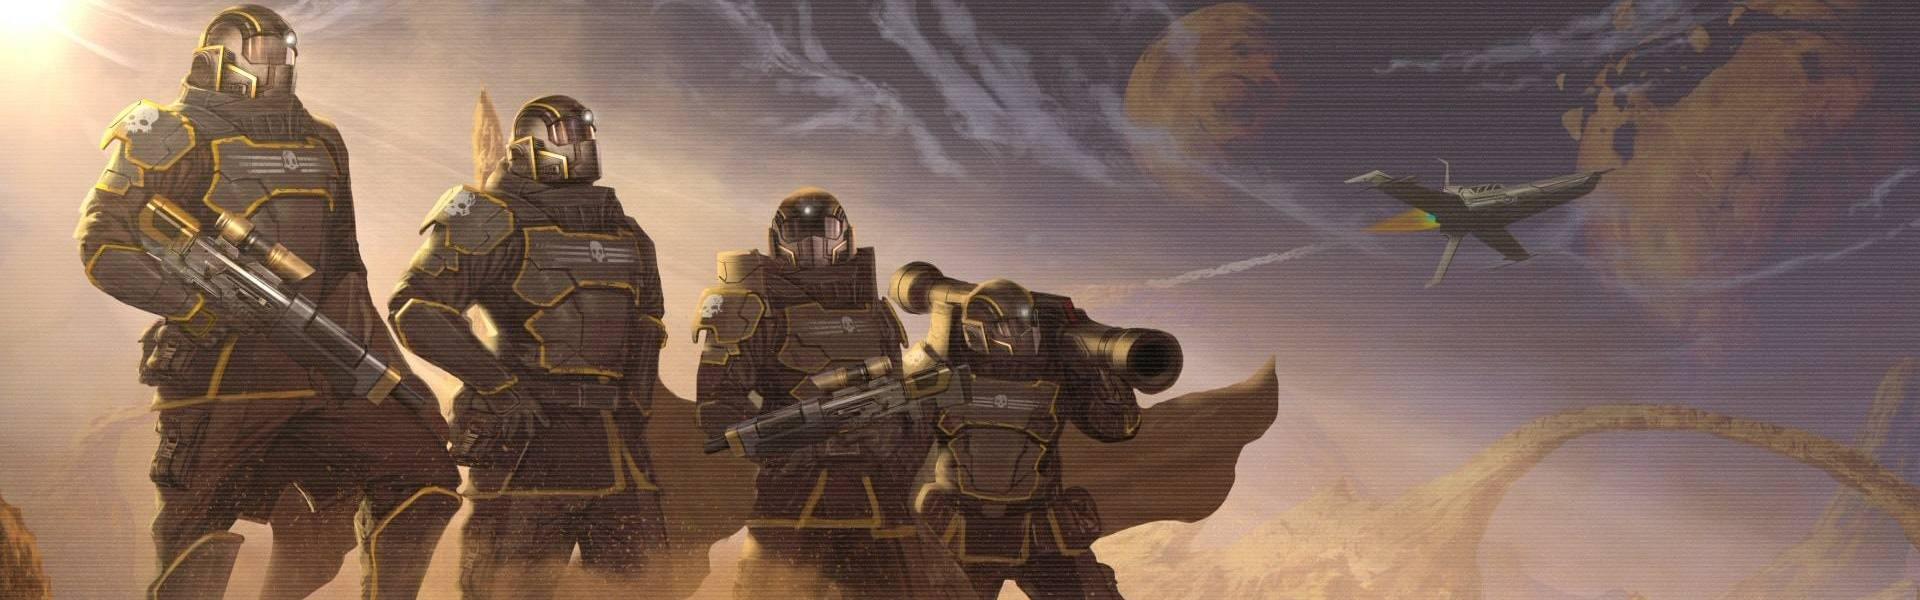 HELLDIVERS - Ranger Pack (DLC) Steam Key GLOBAL